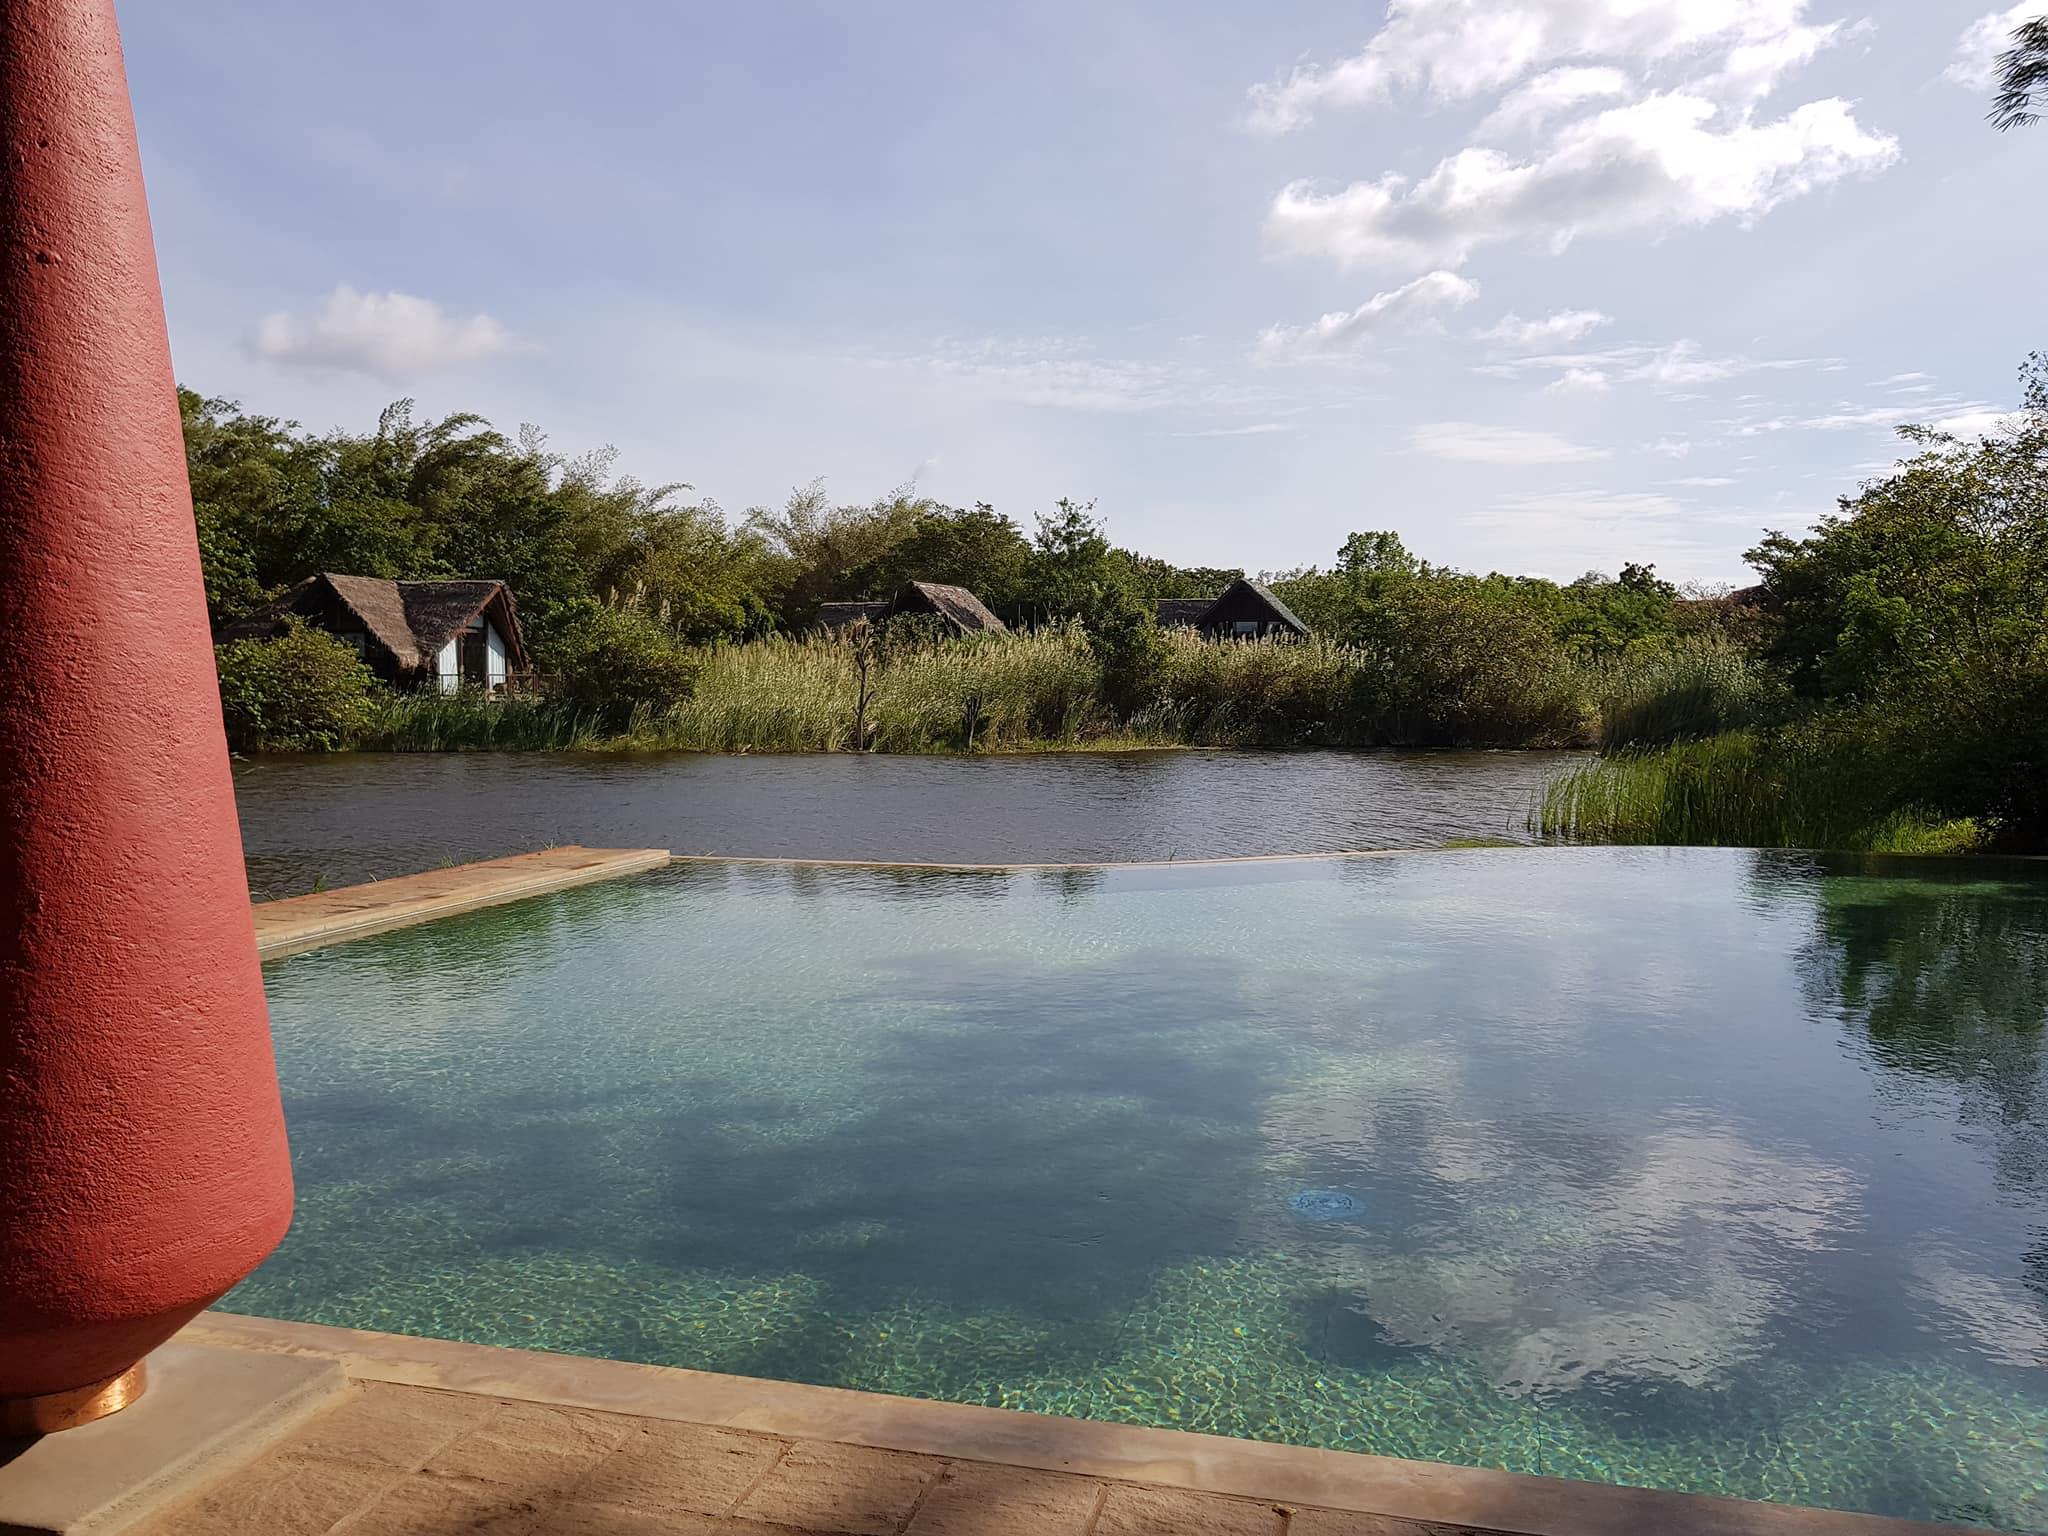 invite-to-paradise-sri-lanka-maldives-holiday-honeymoon-specialists-customer-guest-feedback-zane-lisa-butcher-jetwing-vil-uyana-hotel-sigiriya-cultural-triangle-main-swimming-pool.jpg